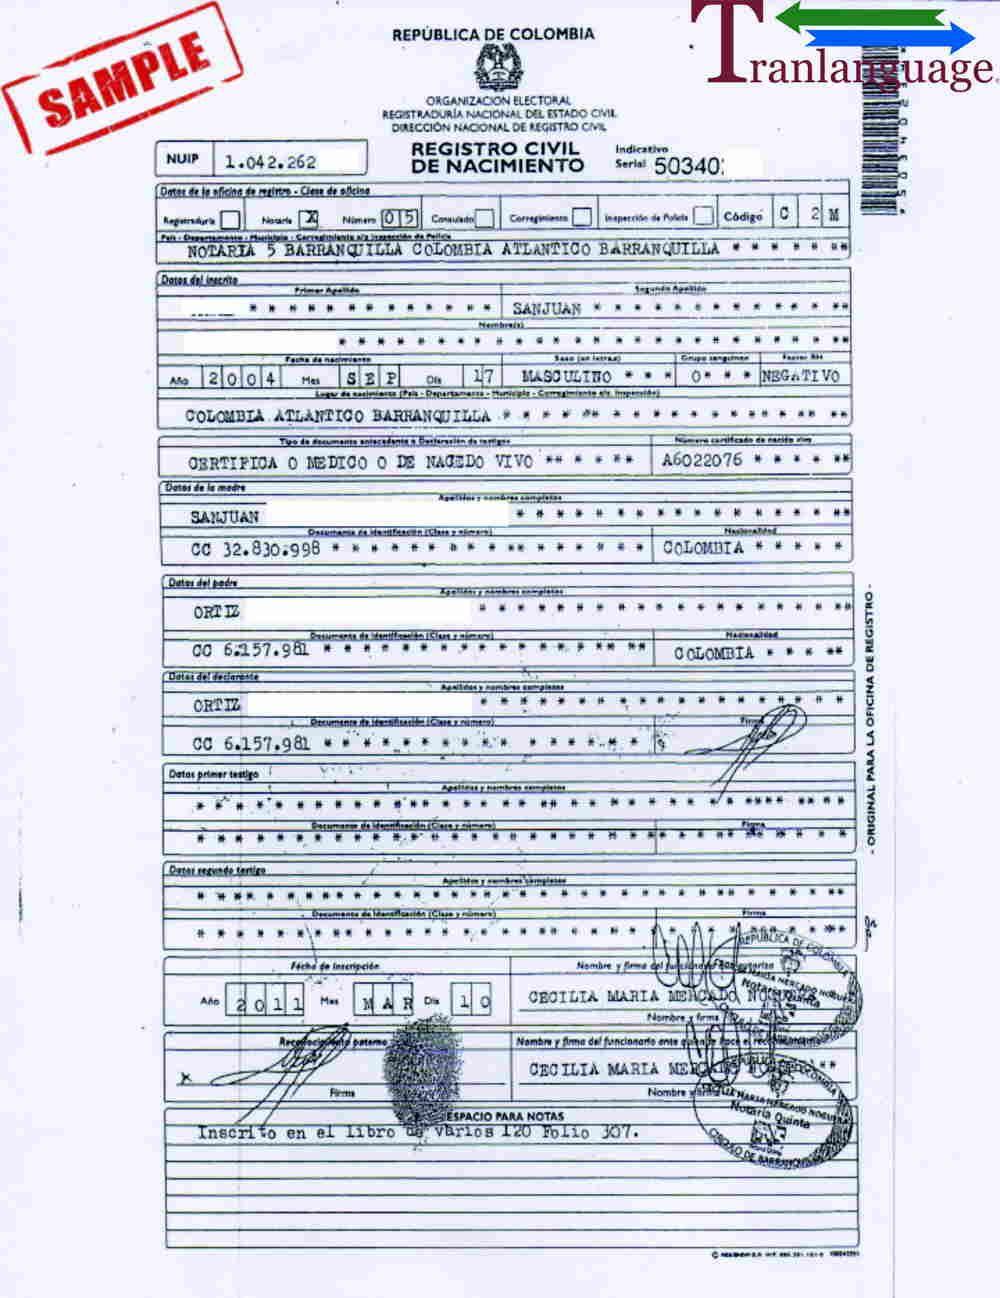 Birth Certificate Colombia Ii Inside Birth Certificate Translation Template Uscis Business Template Birth Certificate Templates Colombian birth certificate translation template